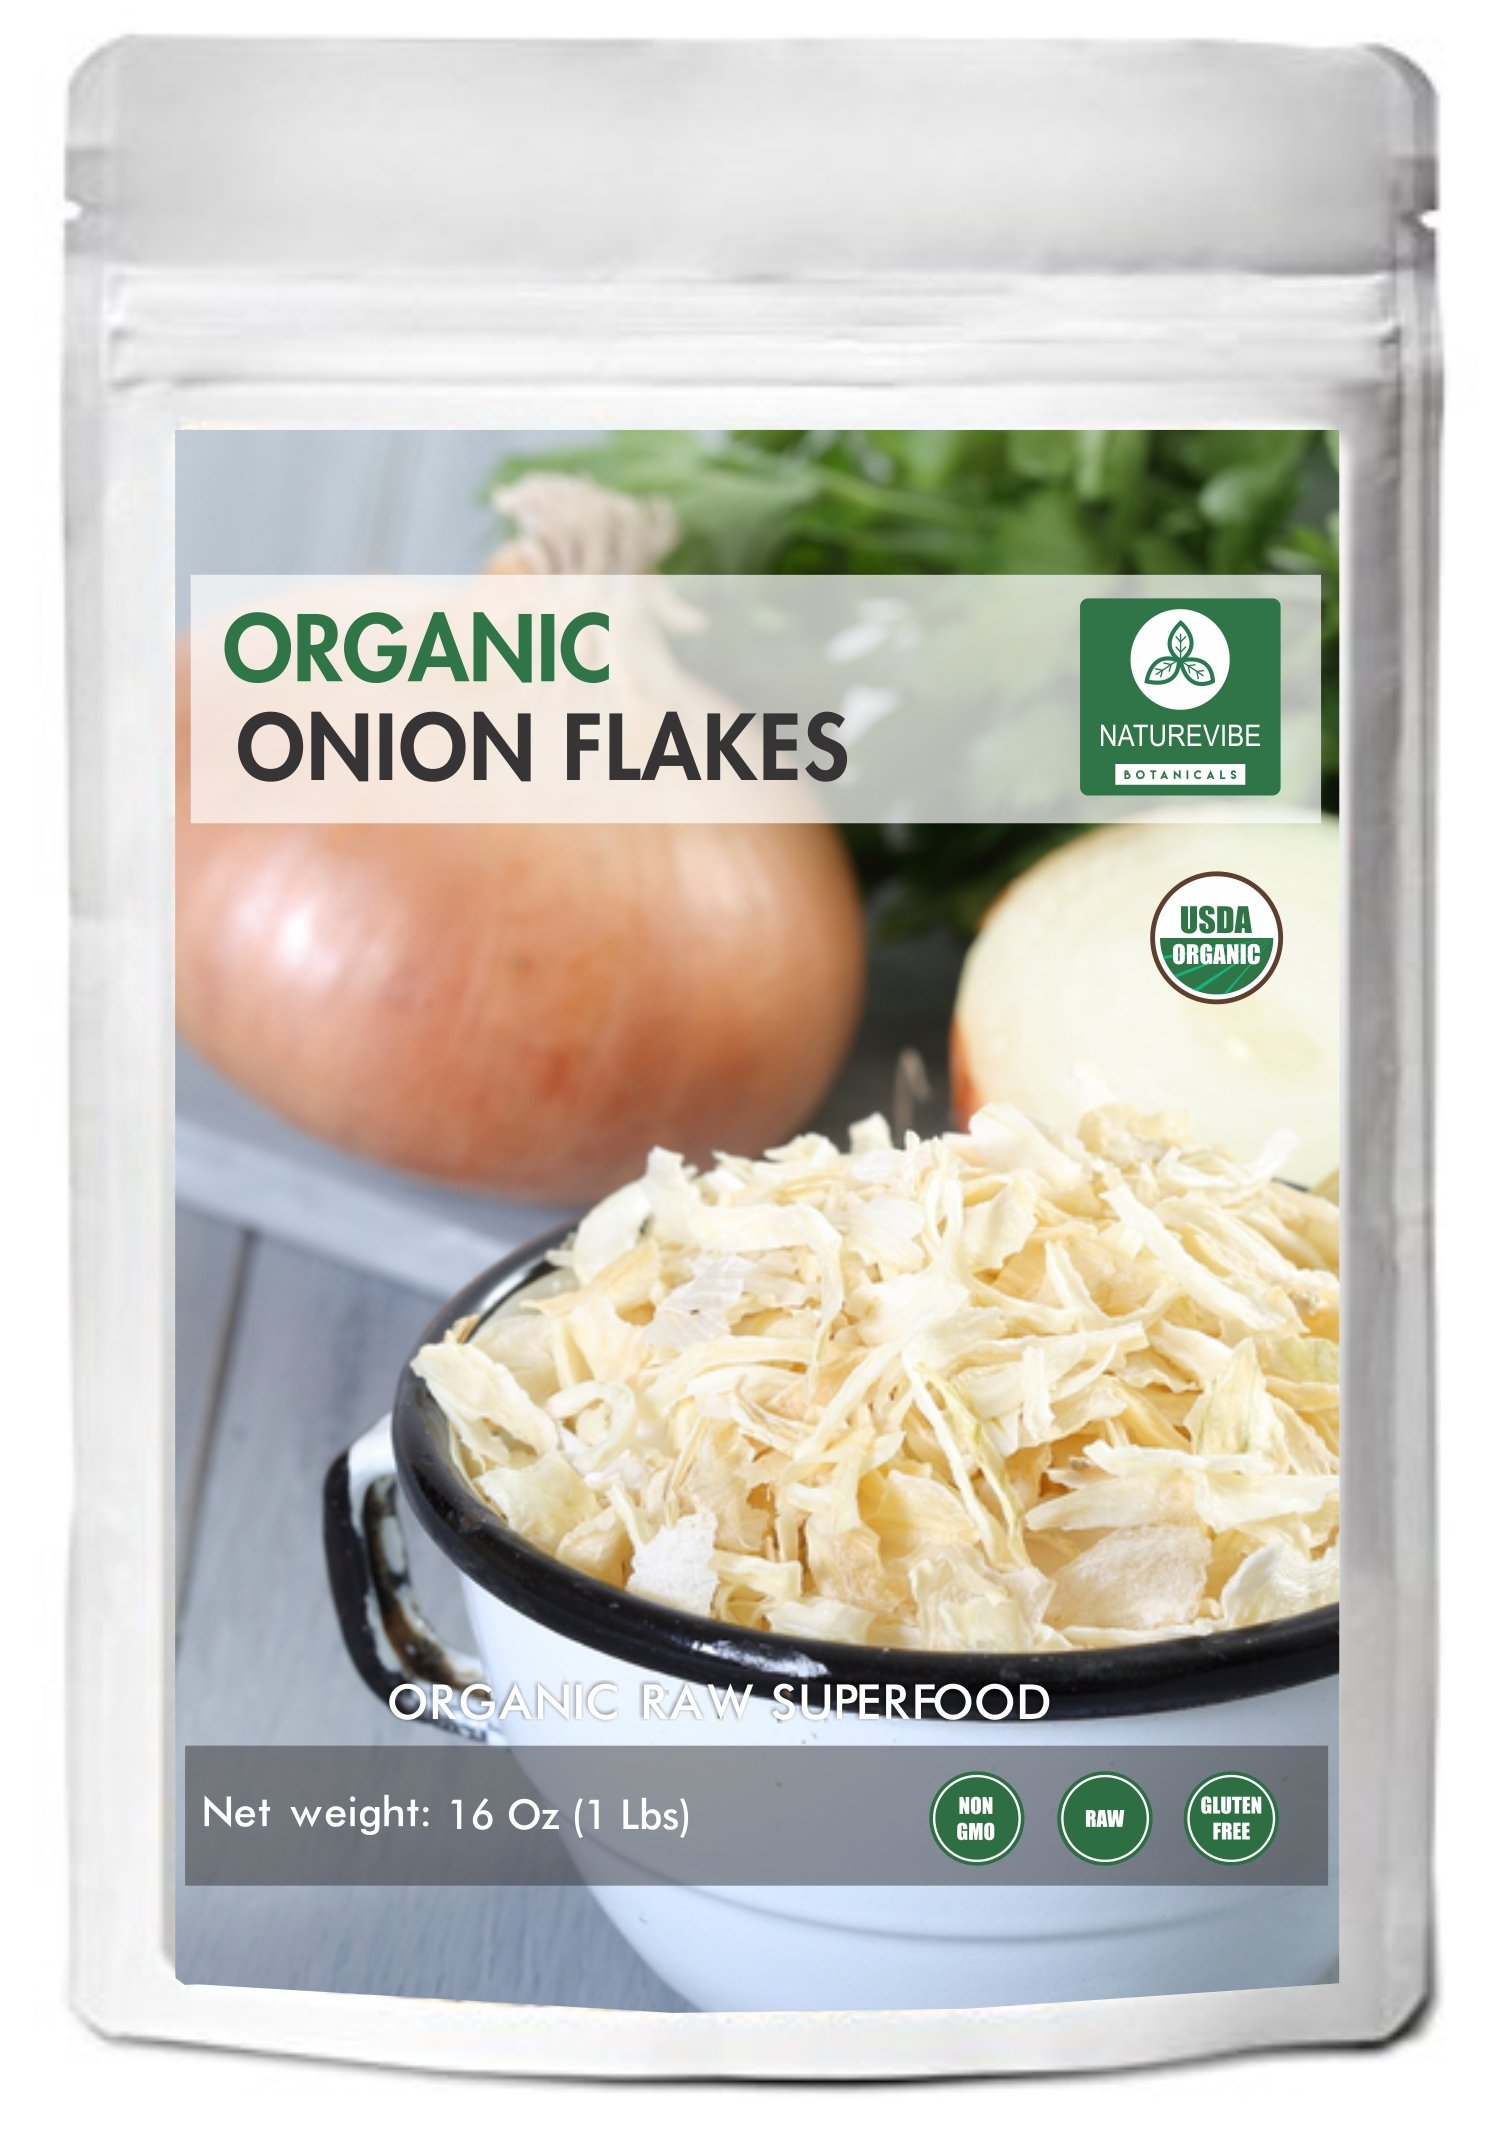 Organic White Onion Flakes (1lb) by Naturevibe Botanicals, Raw, Gluten-Free & Non-GMO (16 ounces)